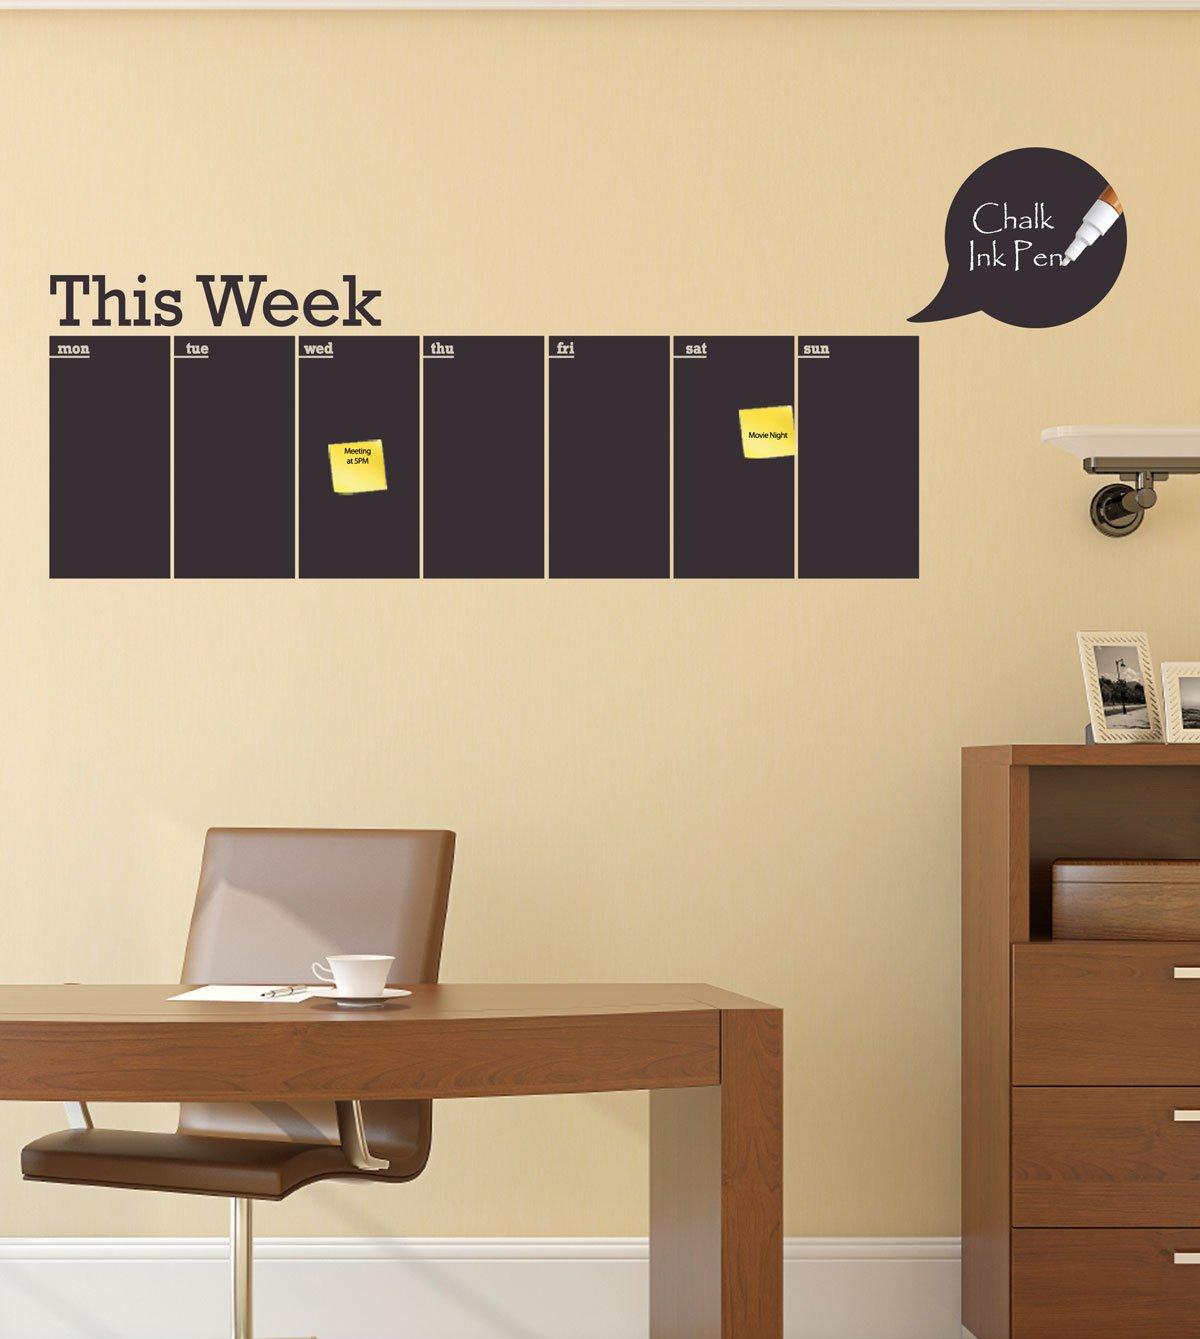 Amazon.com : Weekly Chalkboard Calendar - This Week Horizontal ...